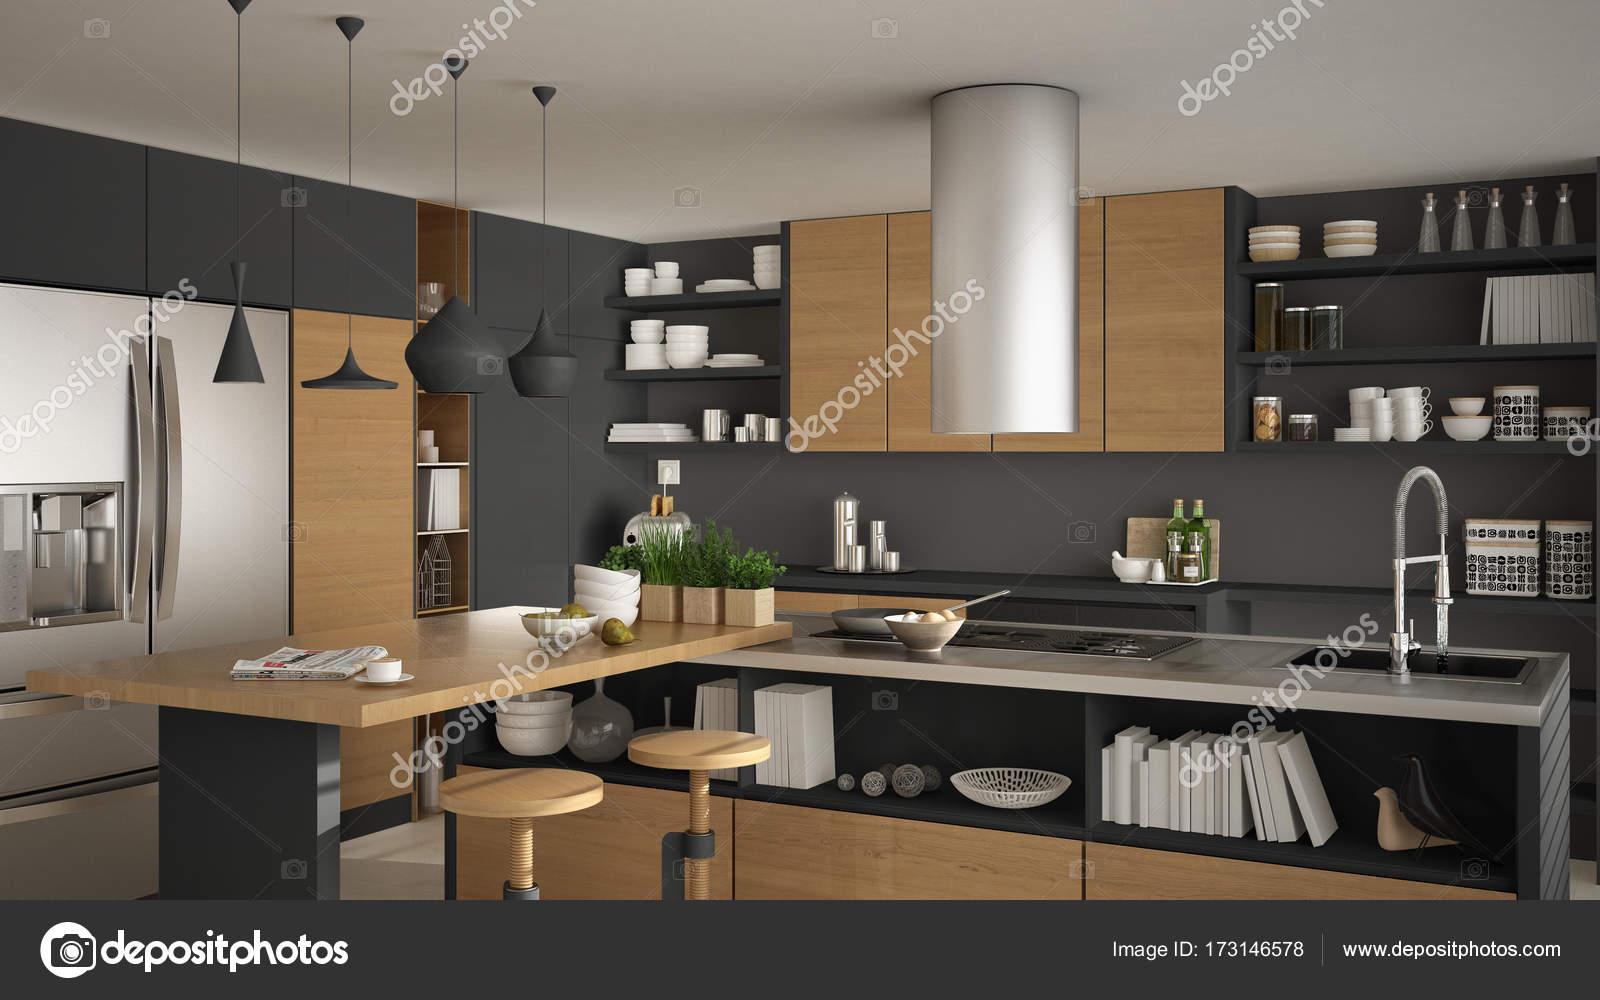 https://st3.depositphotos.com/1152281/17314/i/1600/depositphotos_173146578-stock-photo-modern-wooden-kitchen-with-wooden.jpg